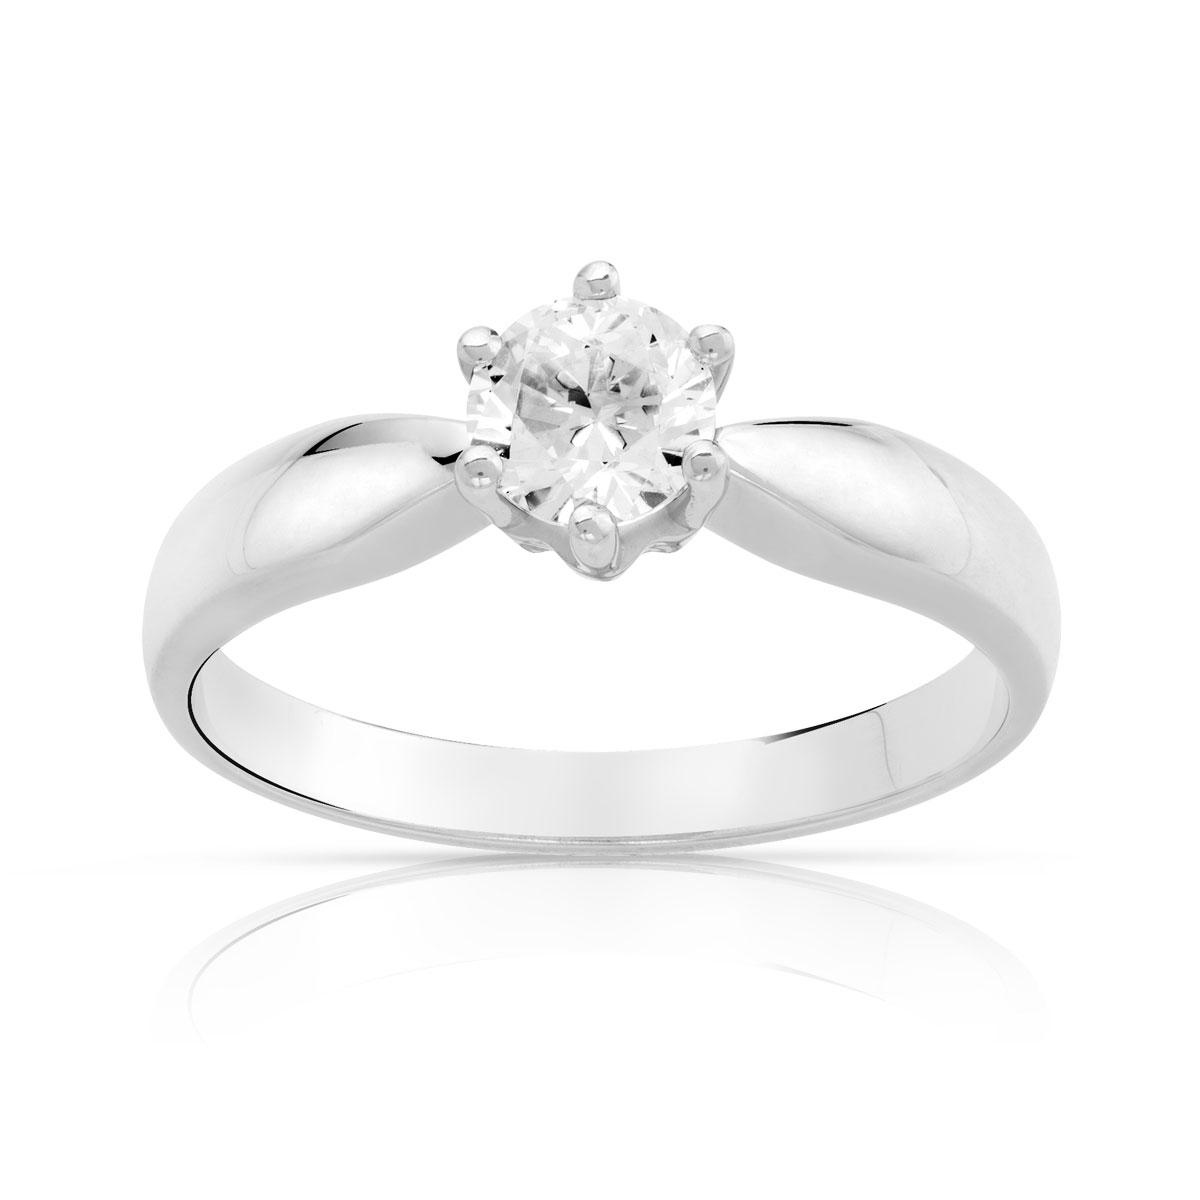 bague solitaire or blanc diamant 1 carat